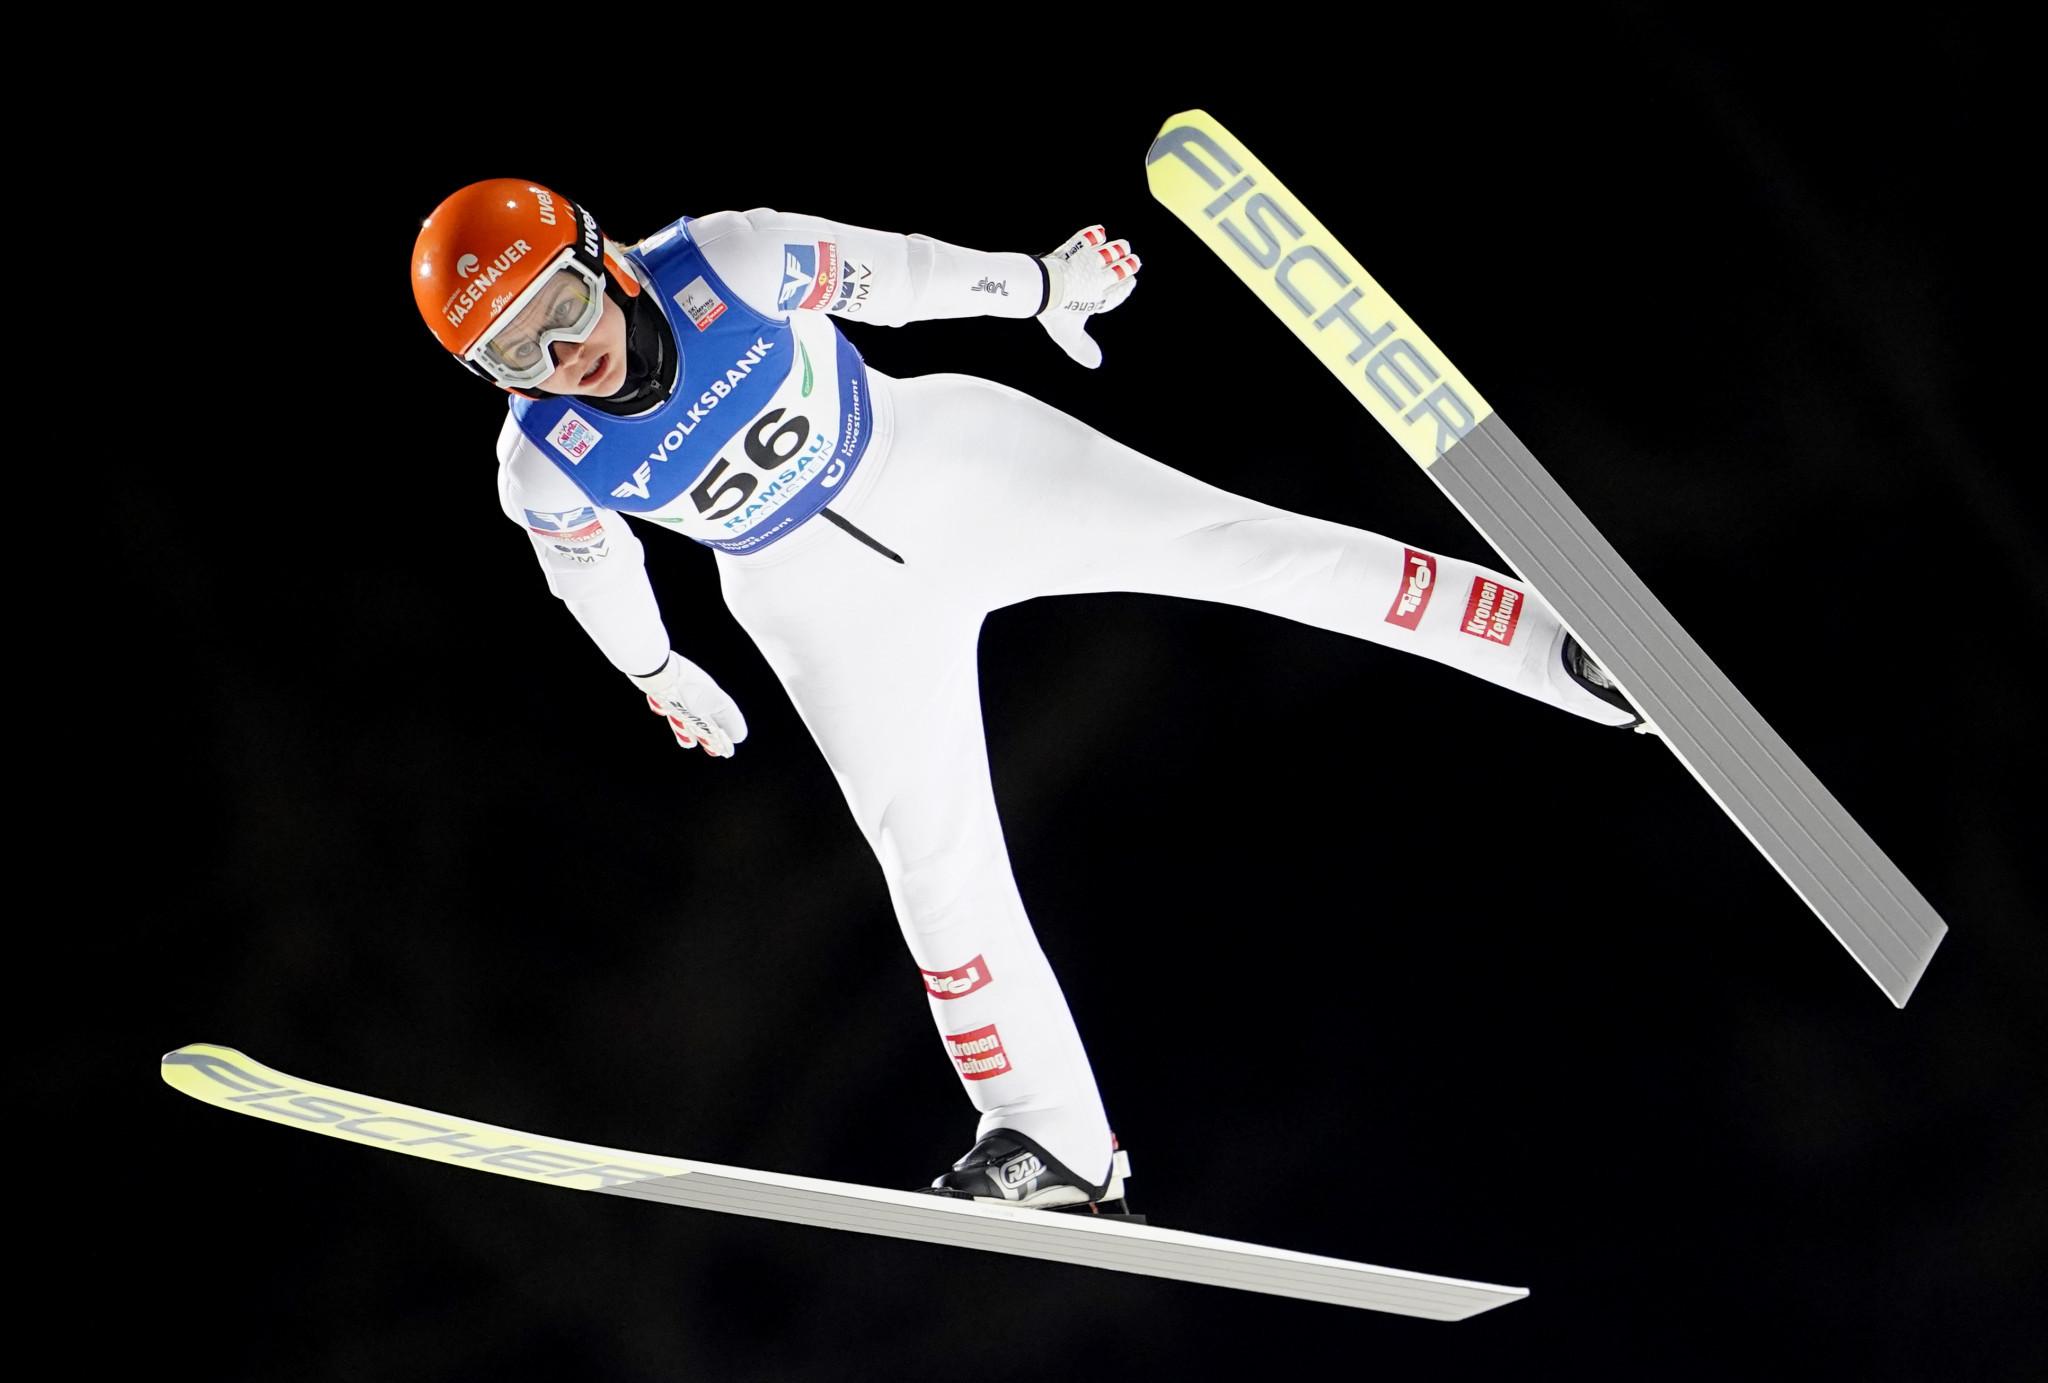 Austria's Marita Kramer topped qualification in Ramsau ©Getty Images